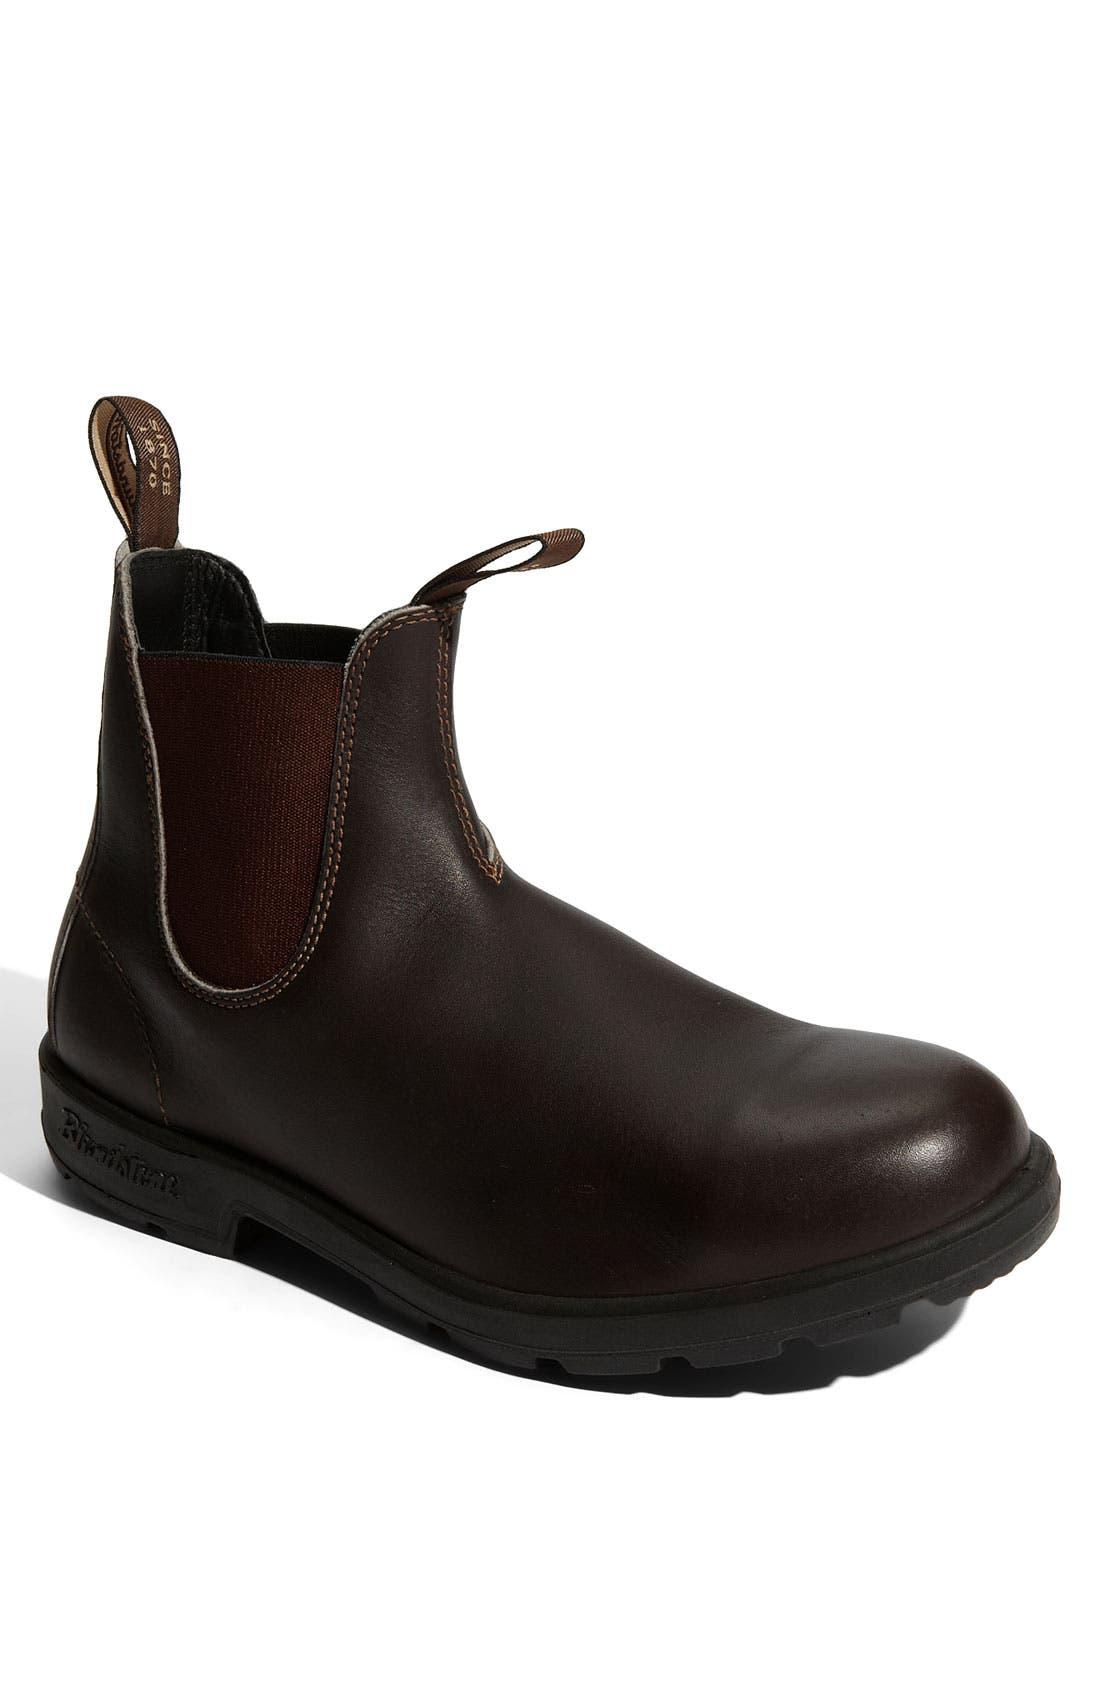 Alternate Image 1 Selected - Blundstone Footwear Classic Boot (Men)